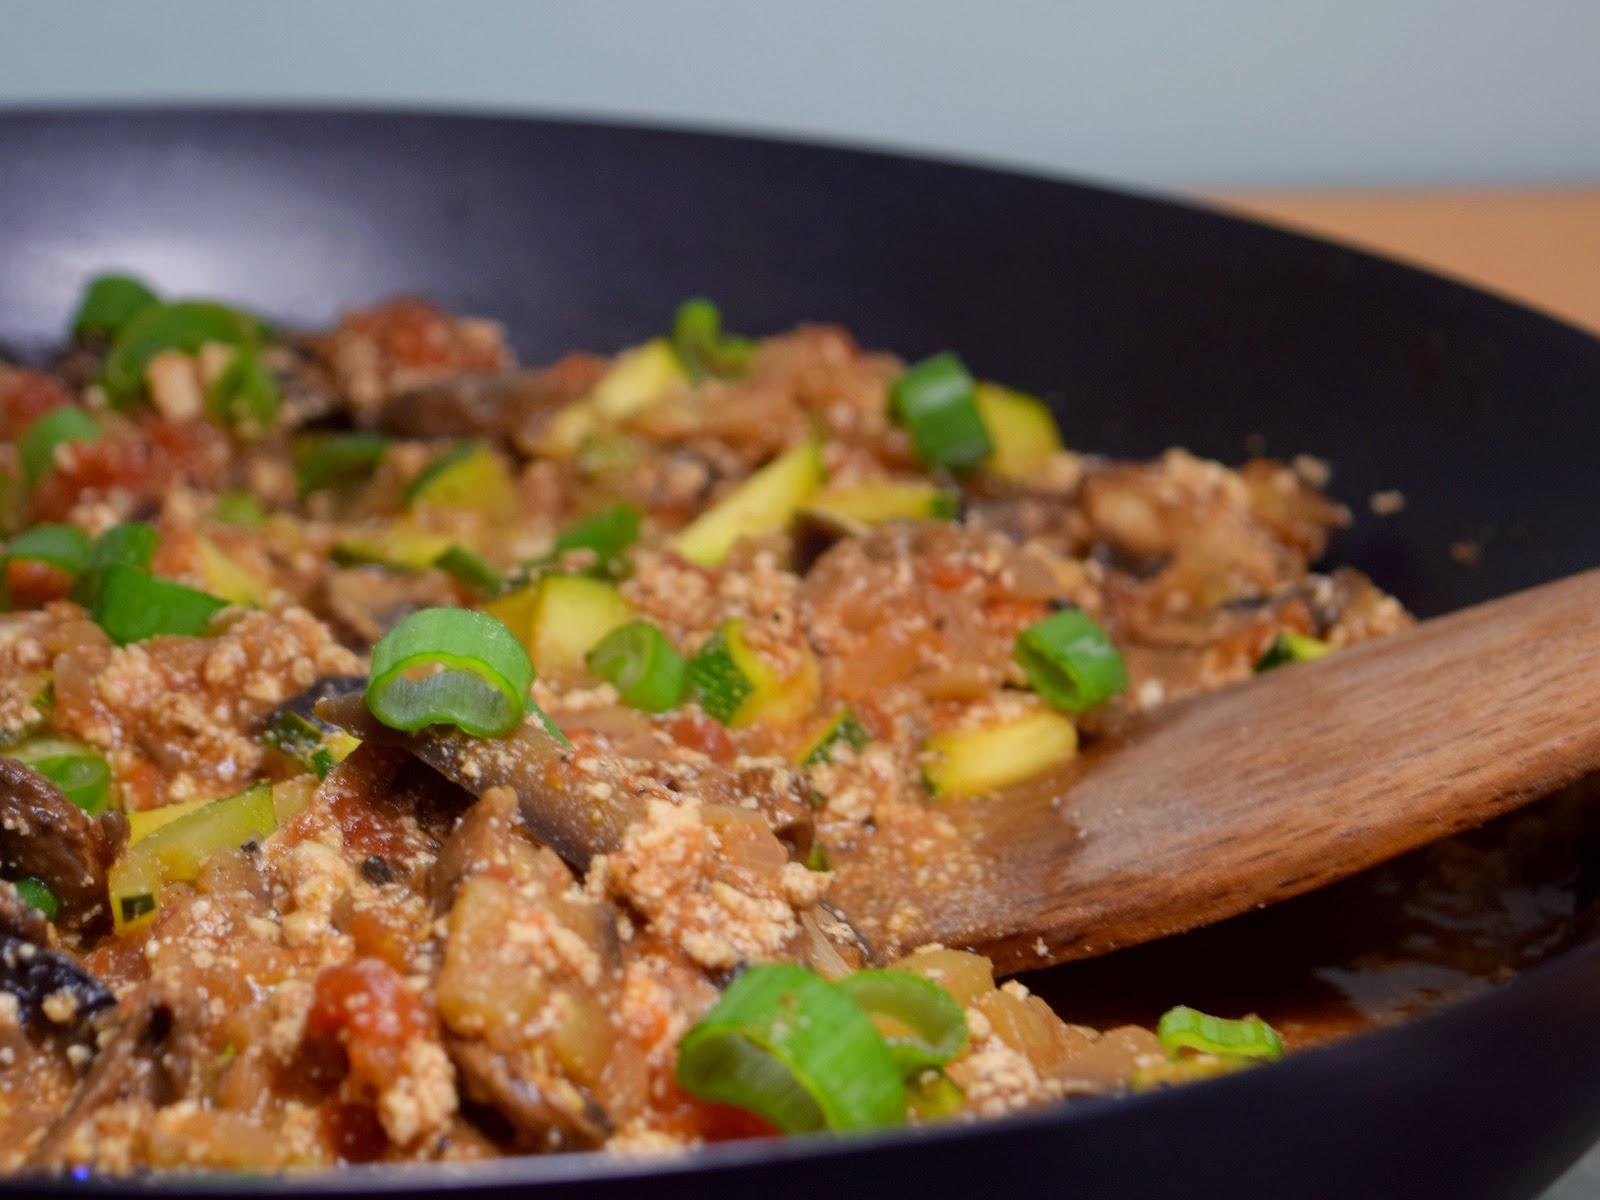 Tofuhack-Gemüse-Pfanne (vegan)